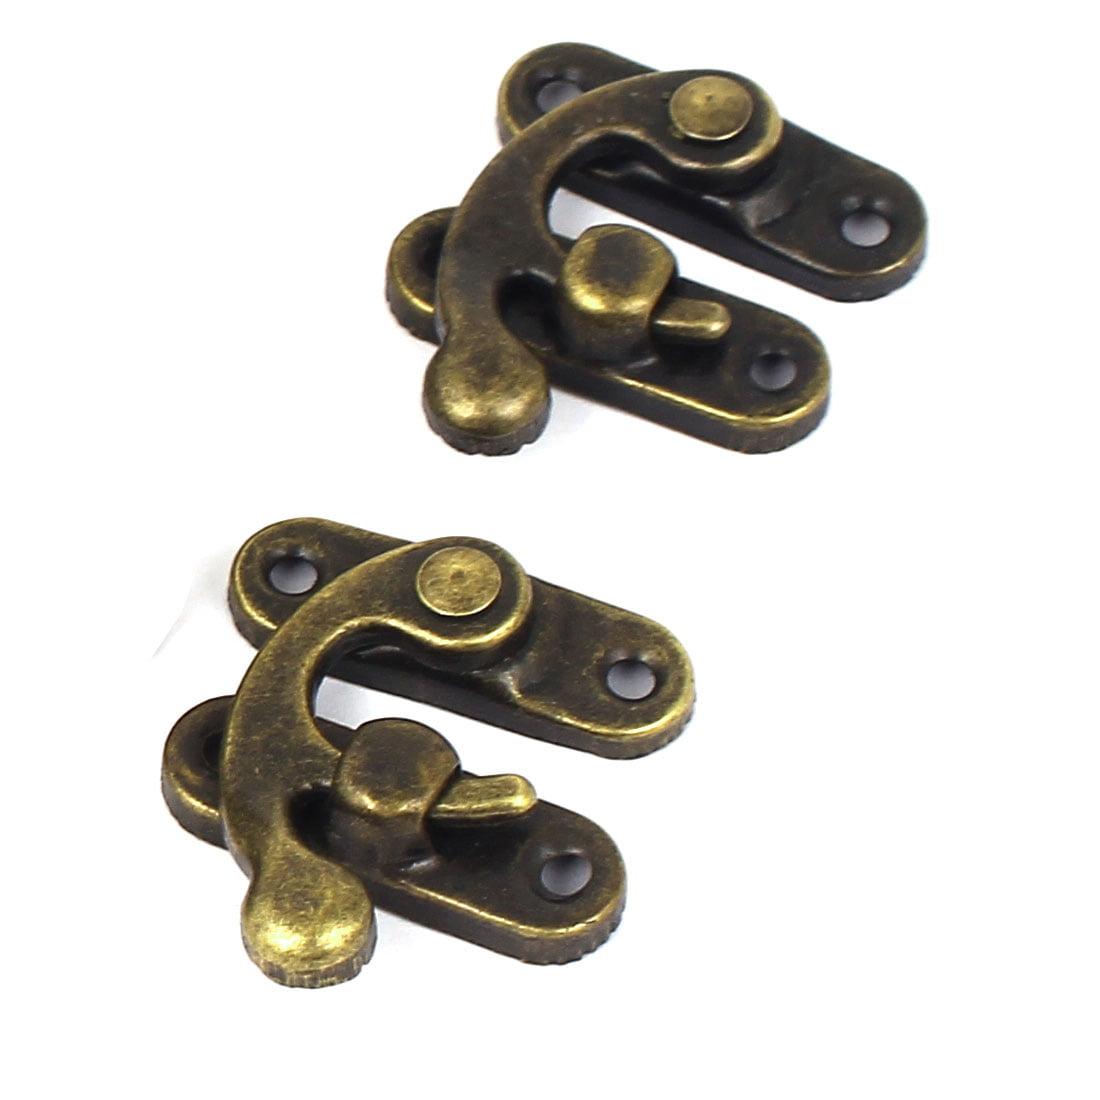 Jewelry Case Gift Box Lock Latch Buckle Clasp Bronze Tone 32x27mm 30pcs - image 2 of 3